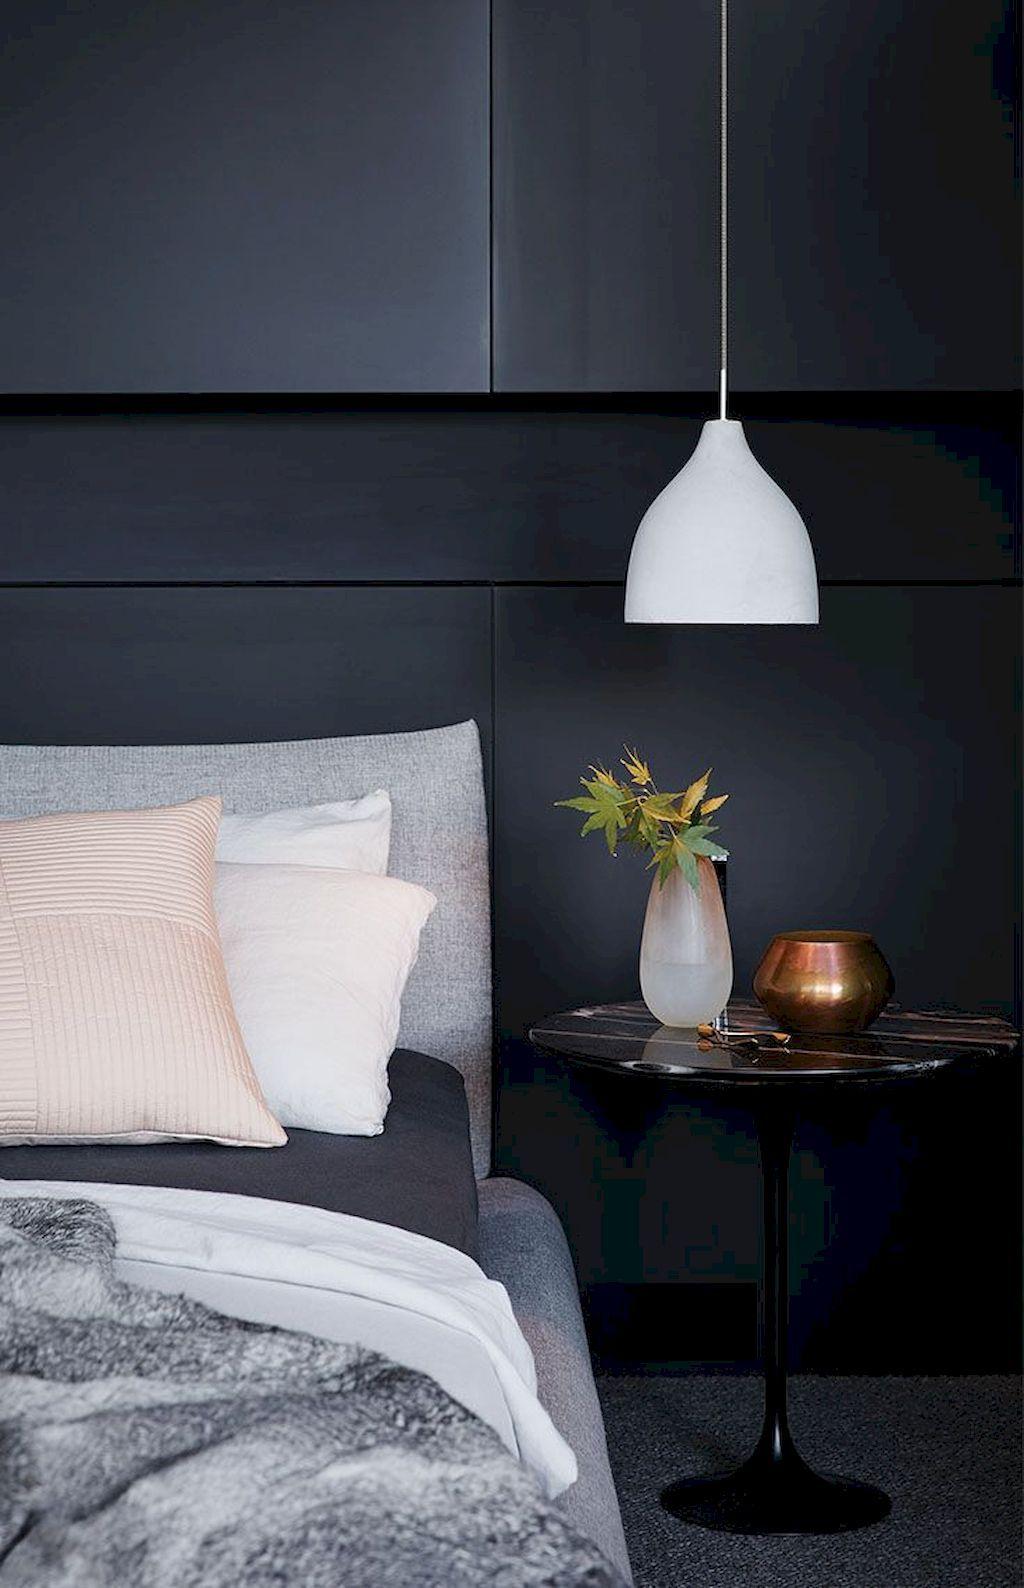 45 Decorative Pendant Lighting With Artsy Shade Designs Pendant Lighting Bedroom Bedroom Lamps Home Decor Bedroom